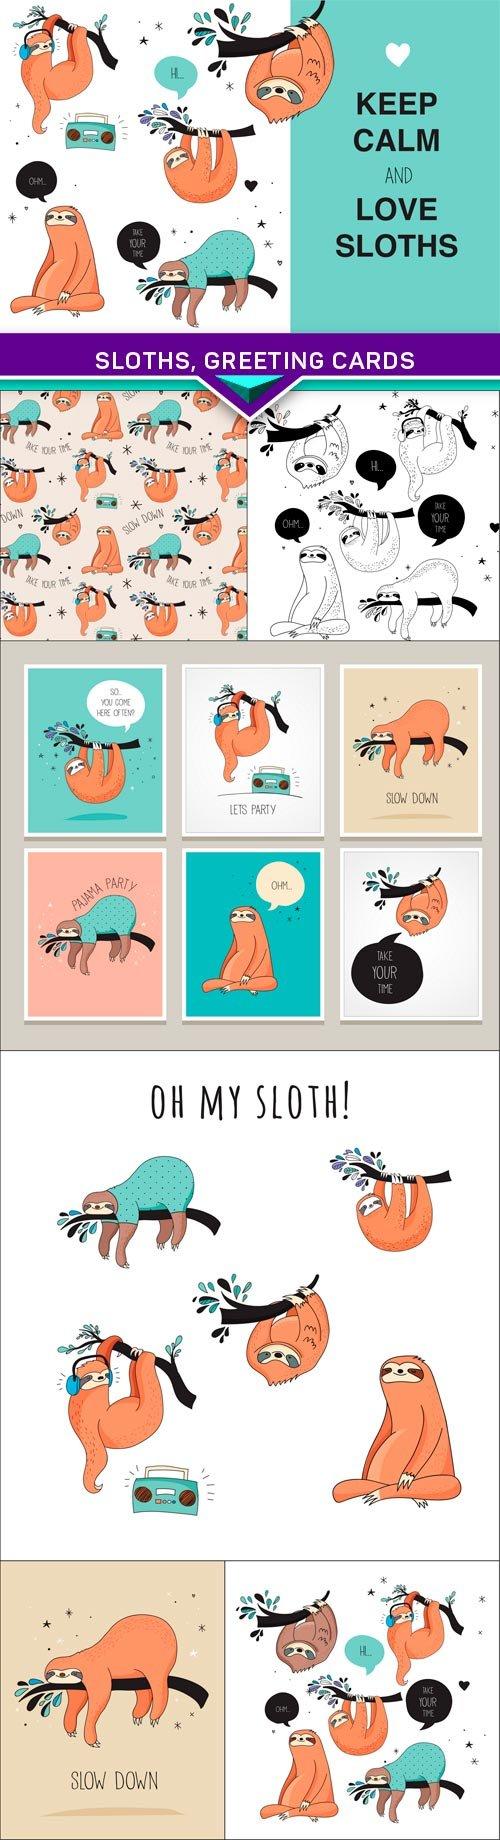 Sloths, greeting cards 7x EPS | Pinterest